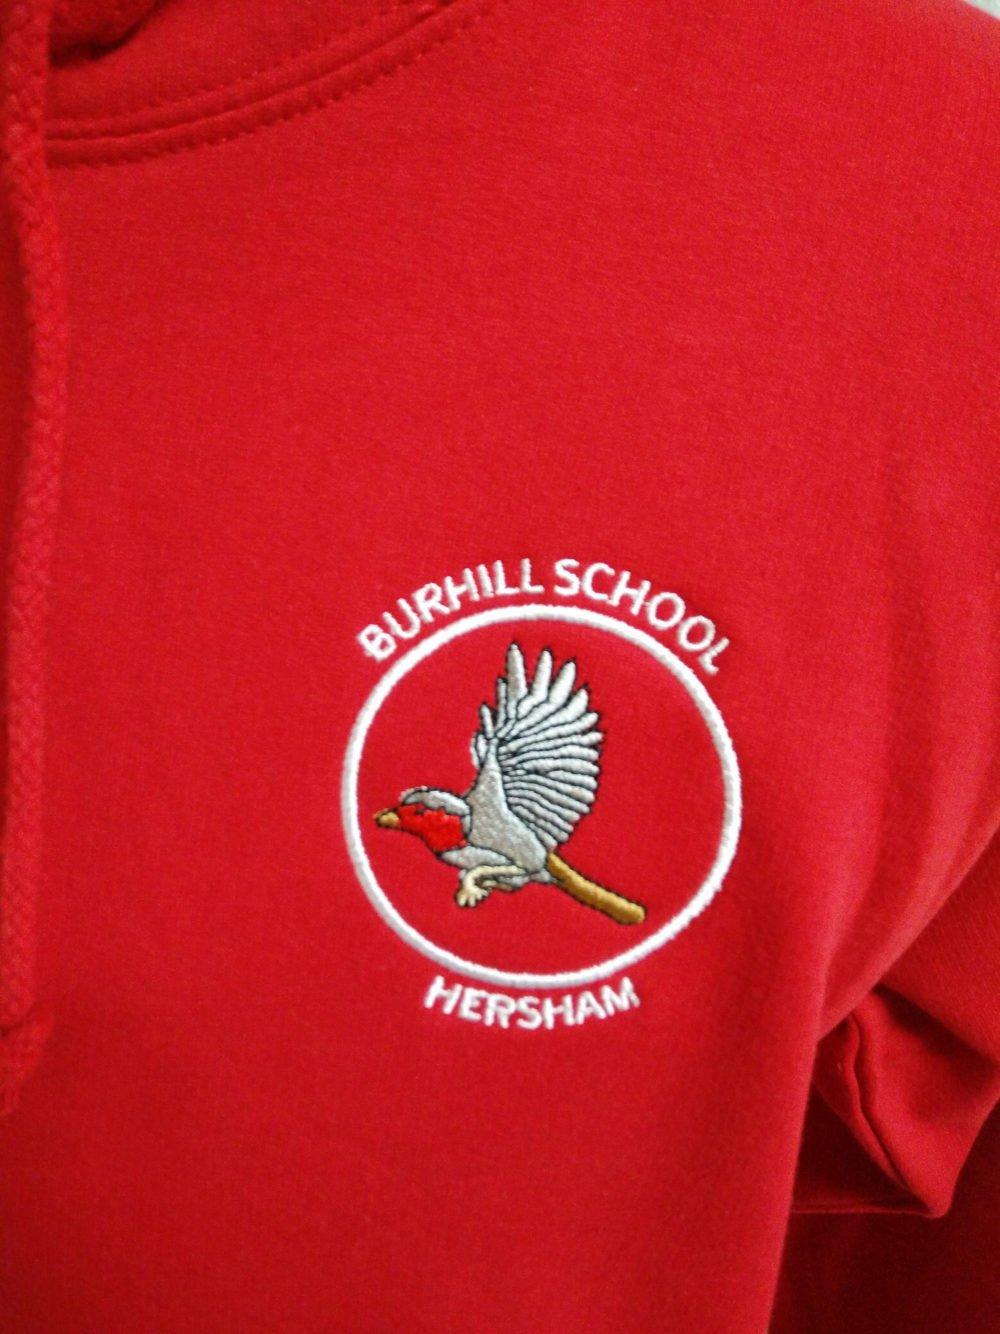 Burhill Bright Red Leavers Hoodies 2018